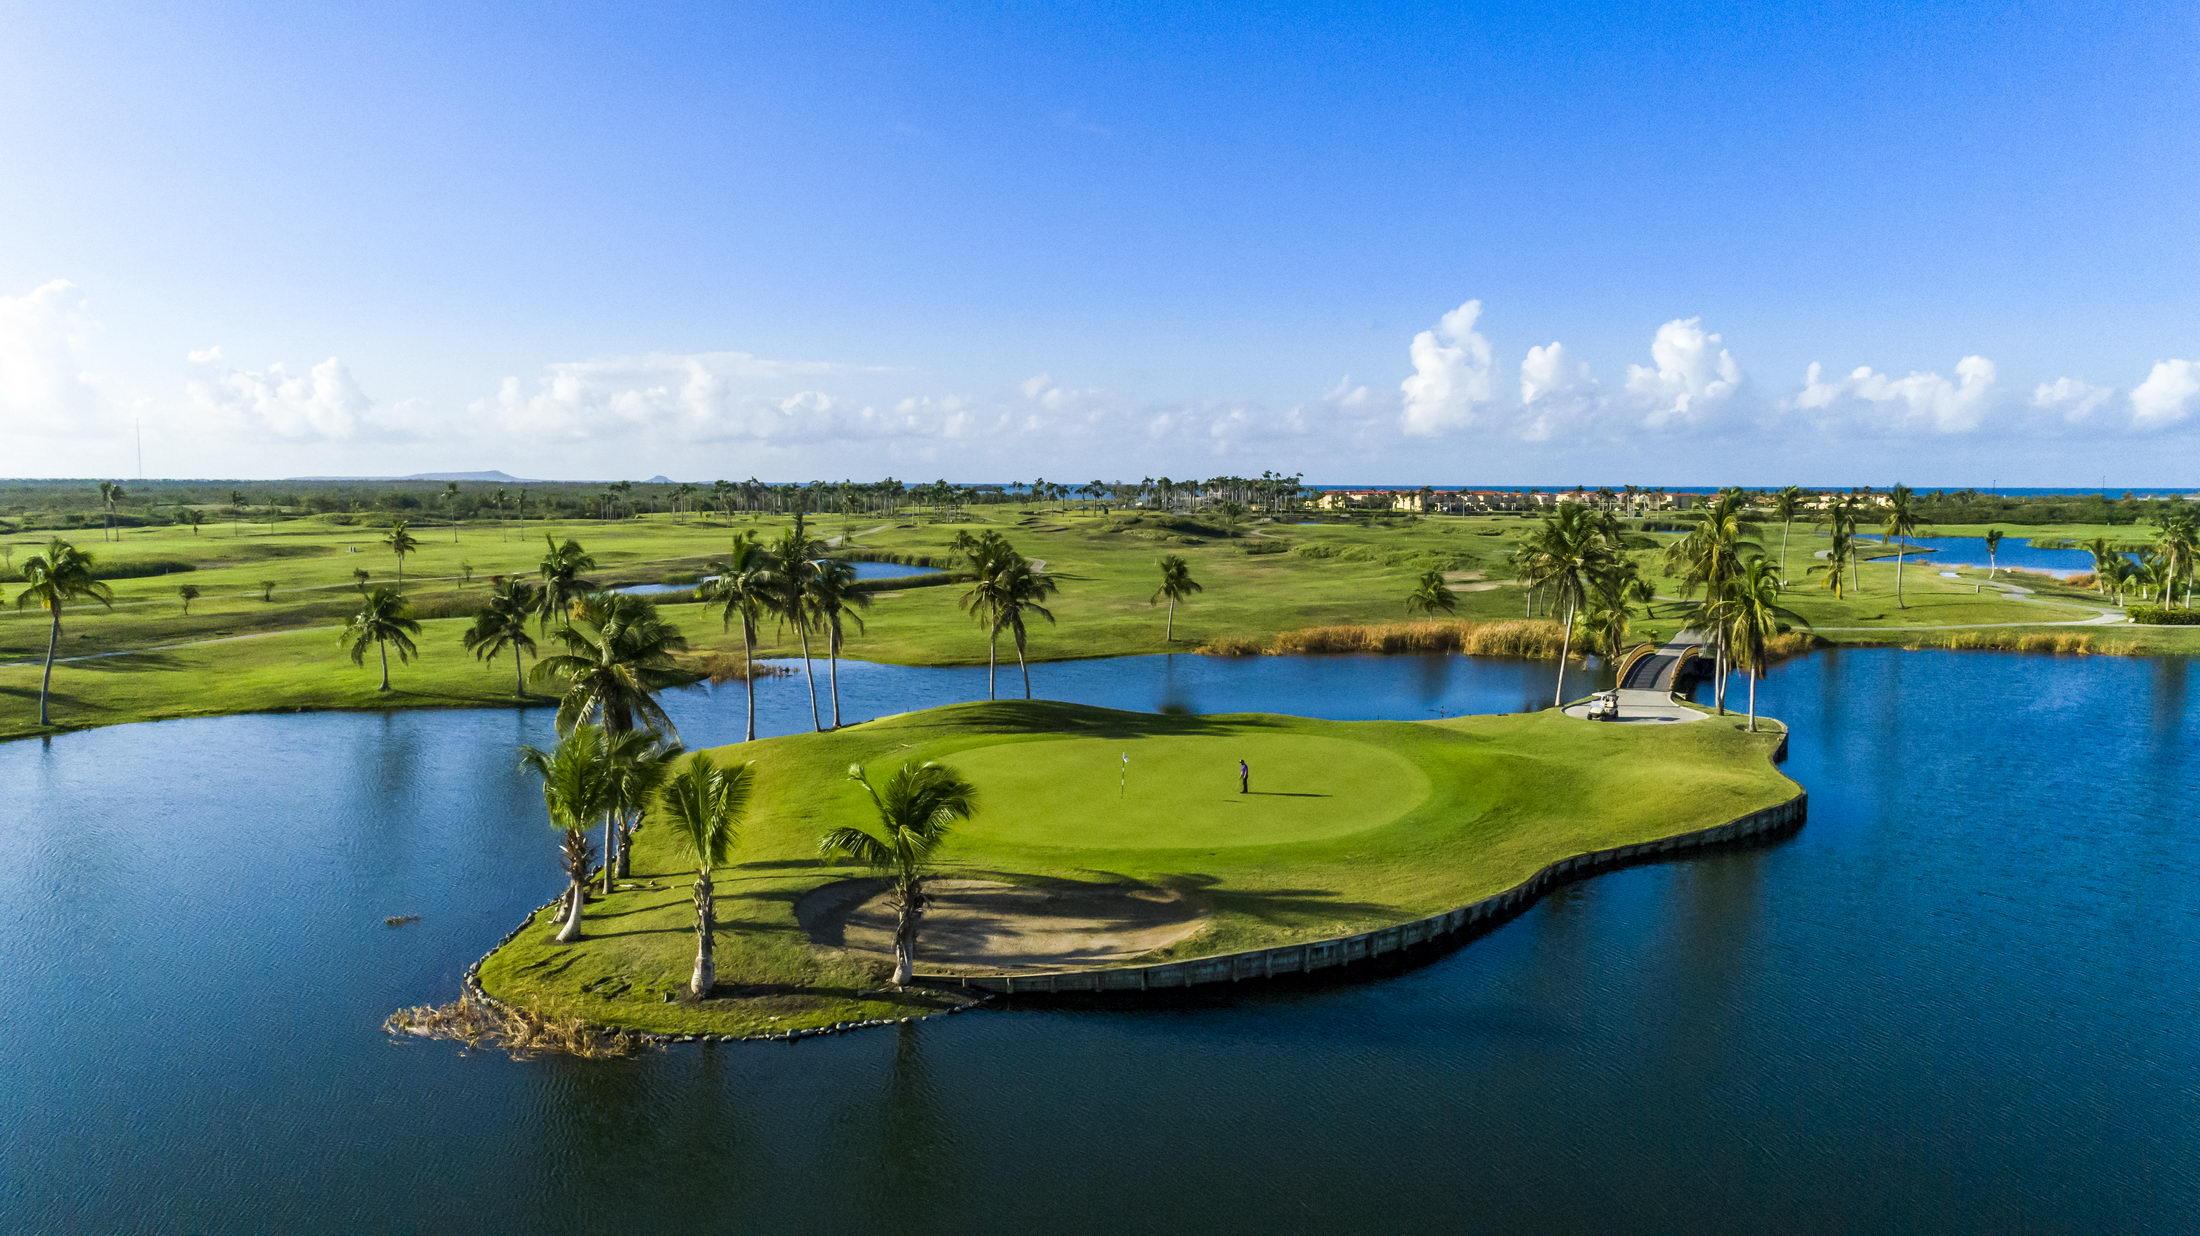 Golf course, resort, island green, puerto rico, casino, hotel, resort